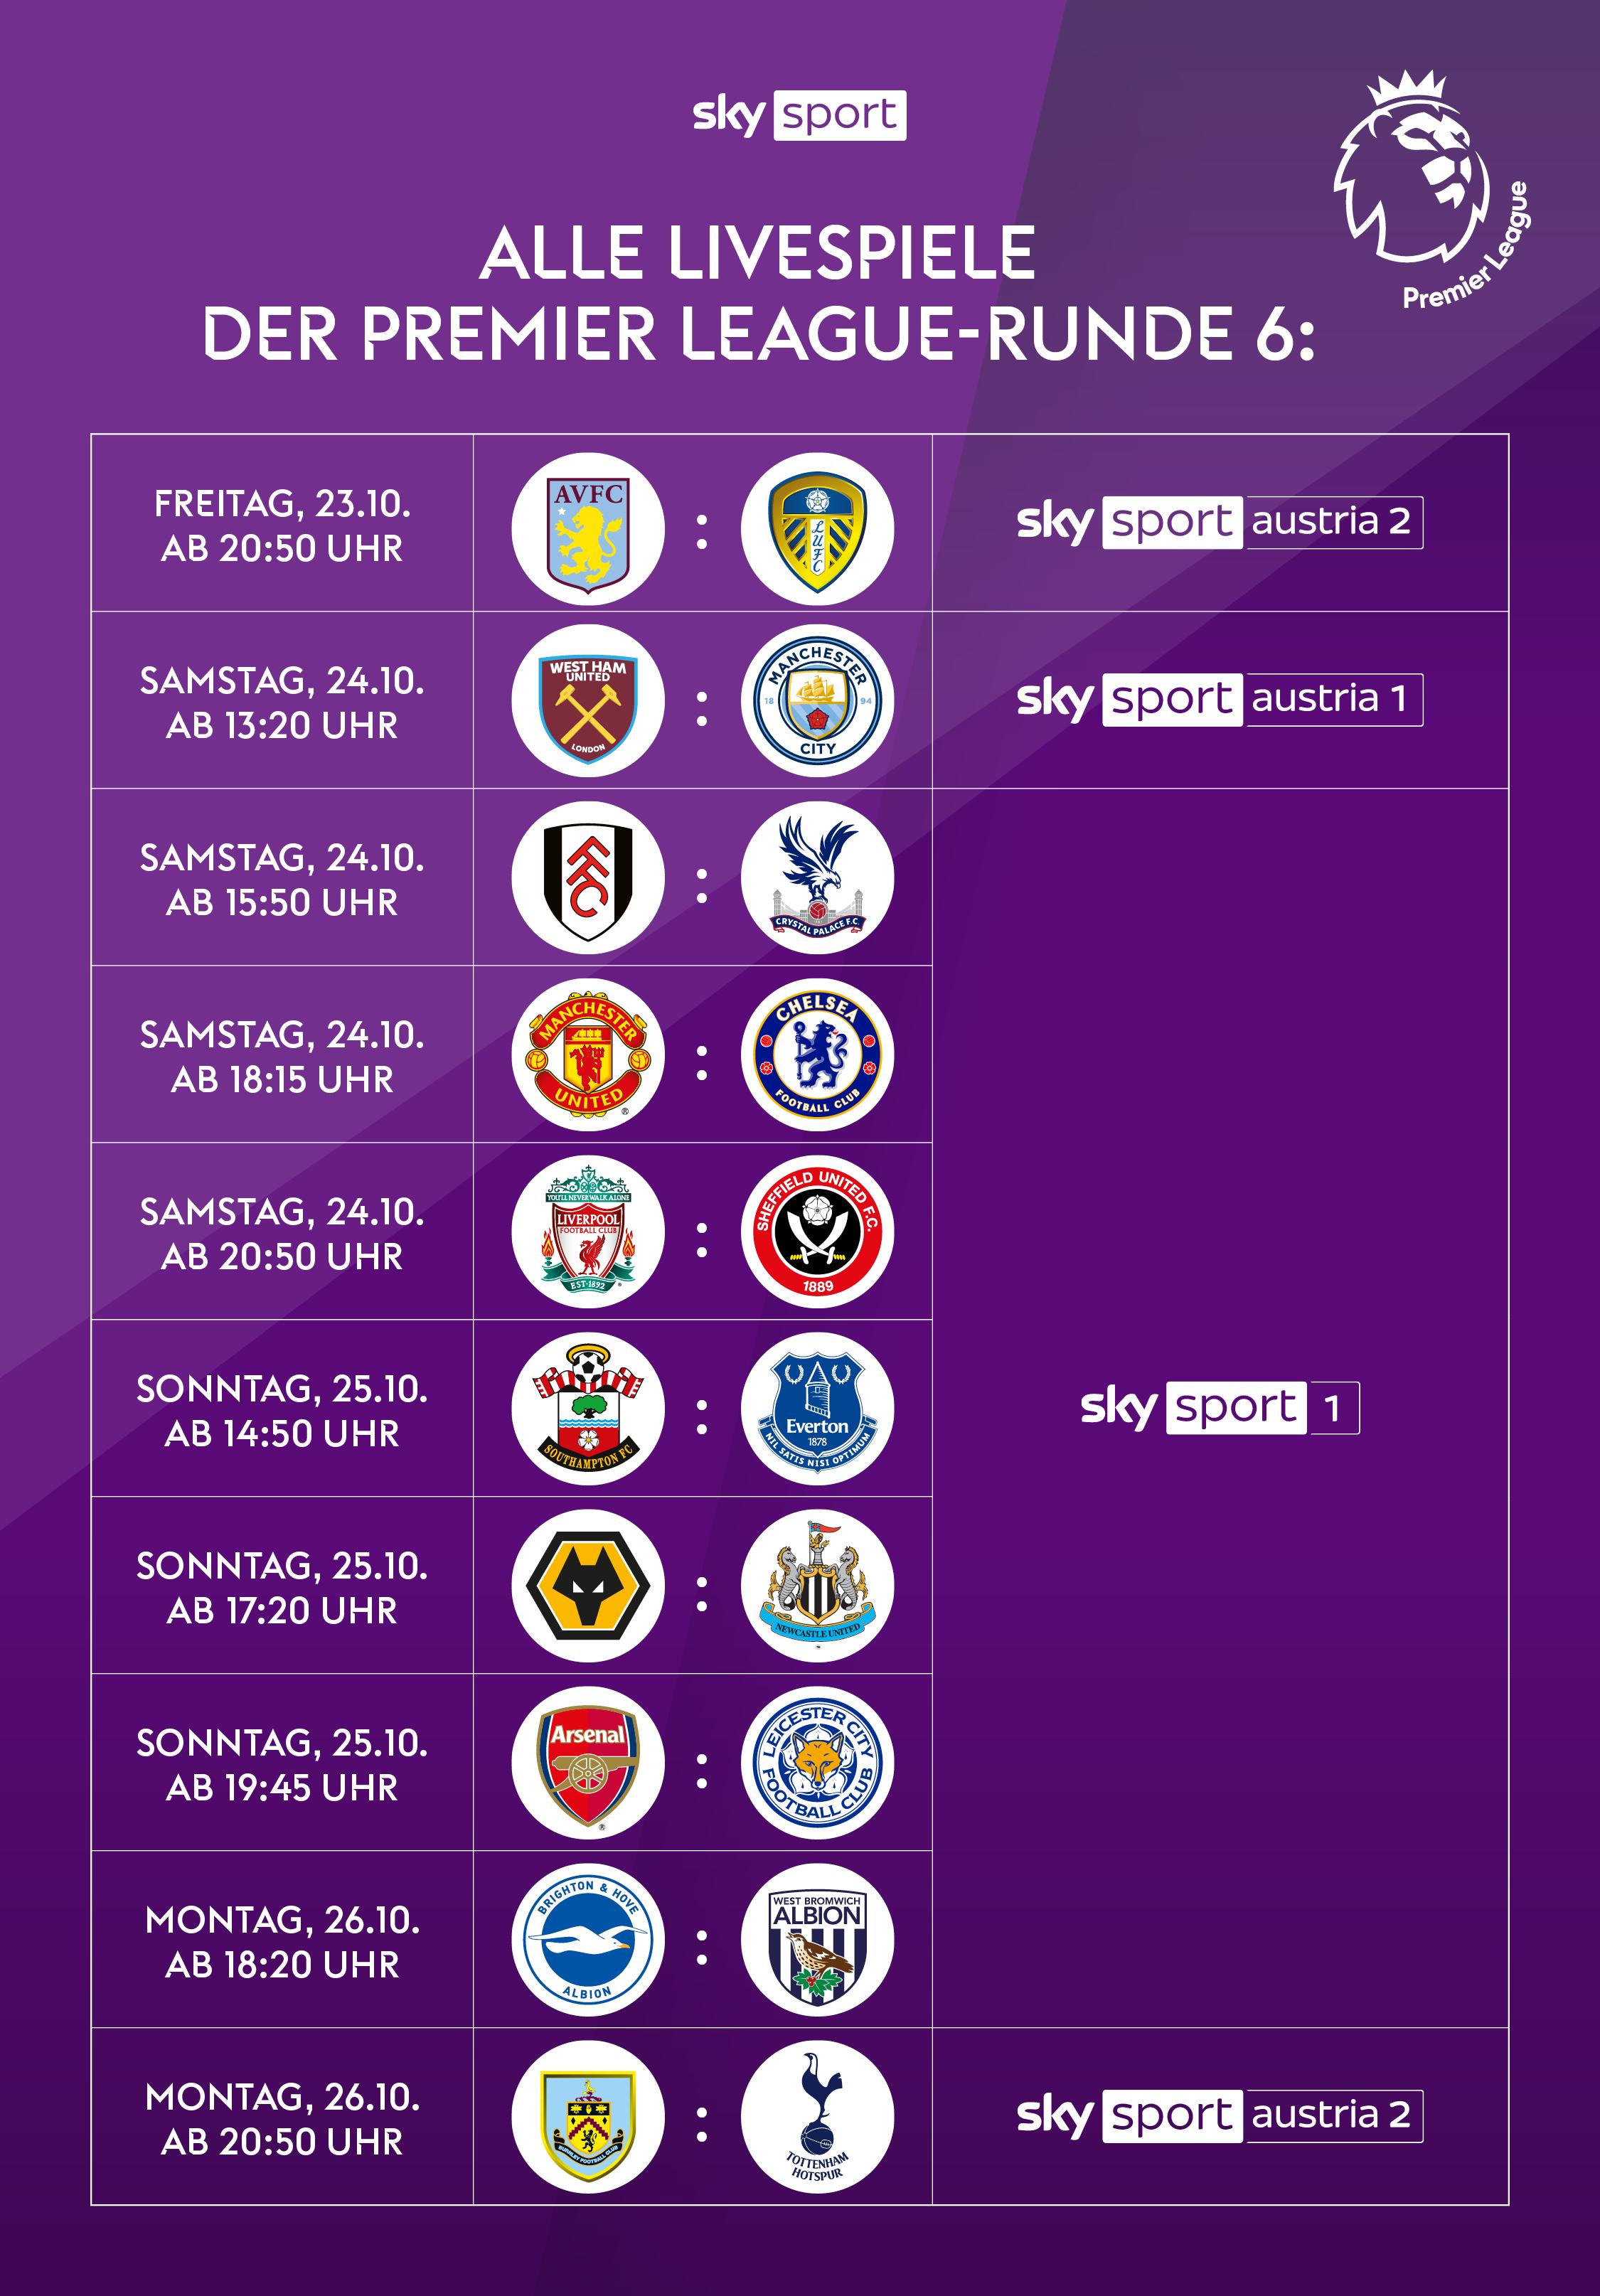 Die Premier League live streamen mit Sky X